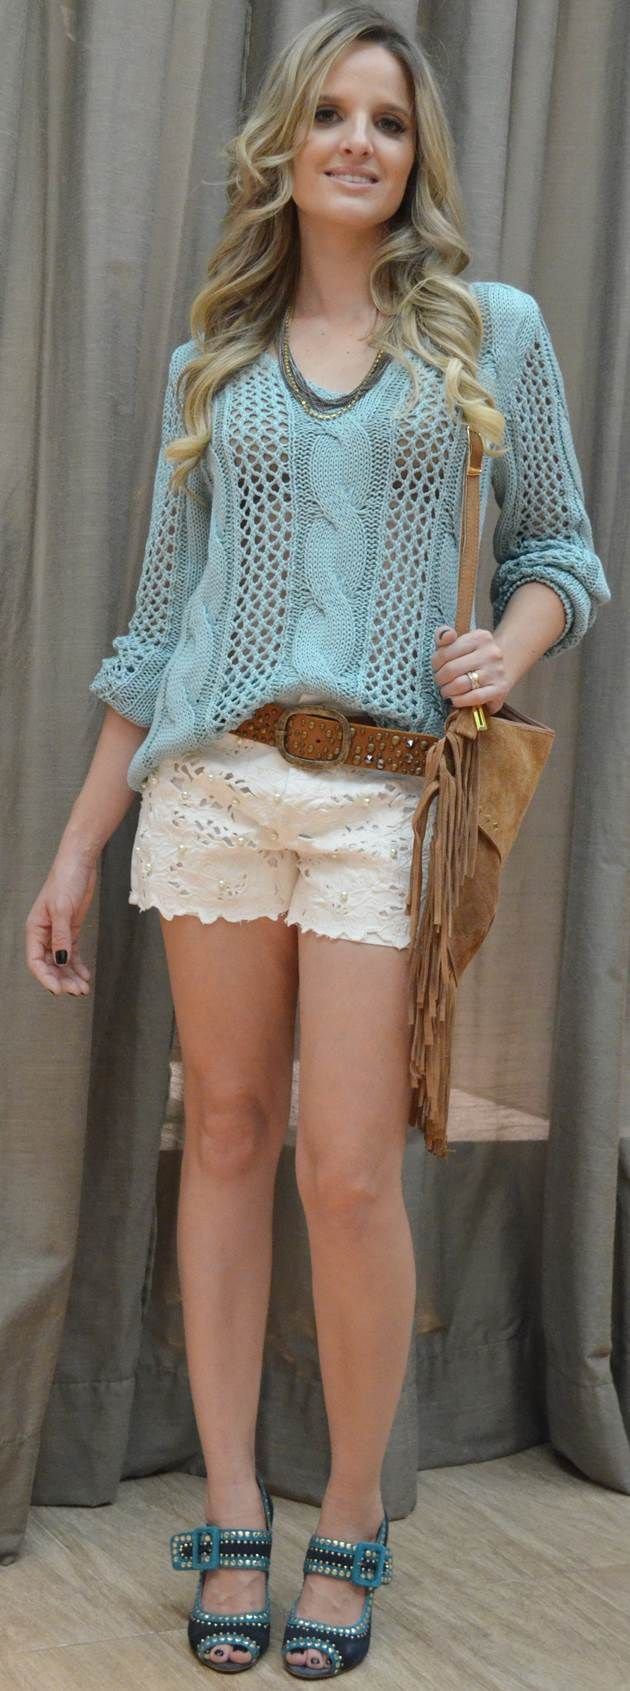 Blusa em croche, blusa da moda